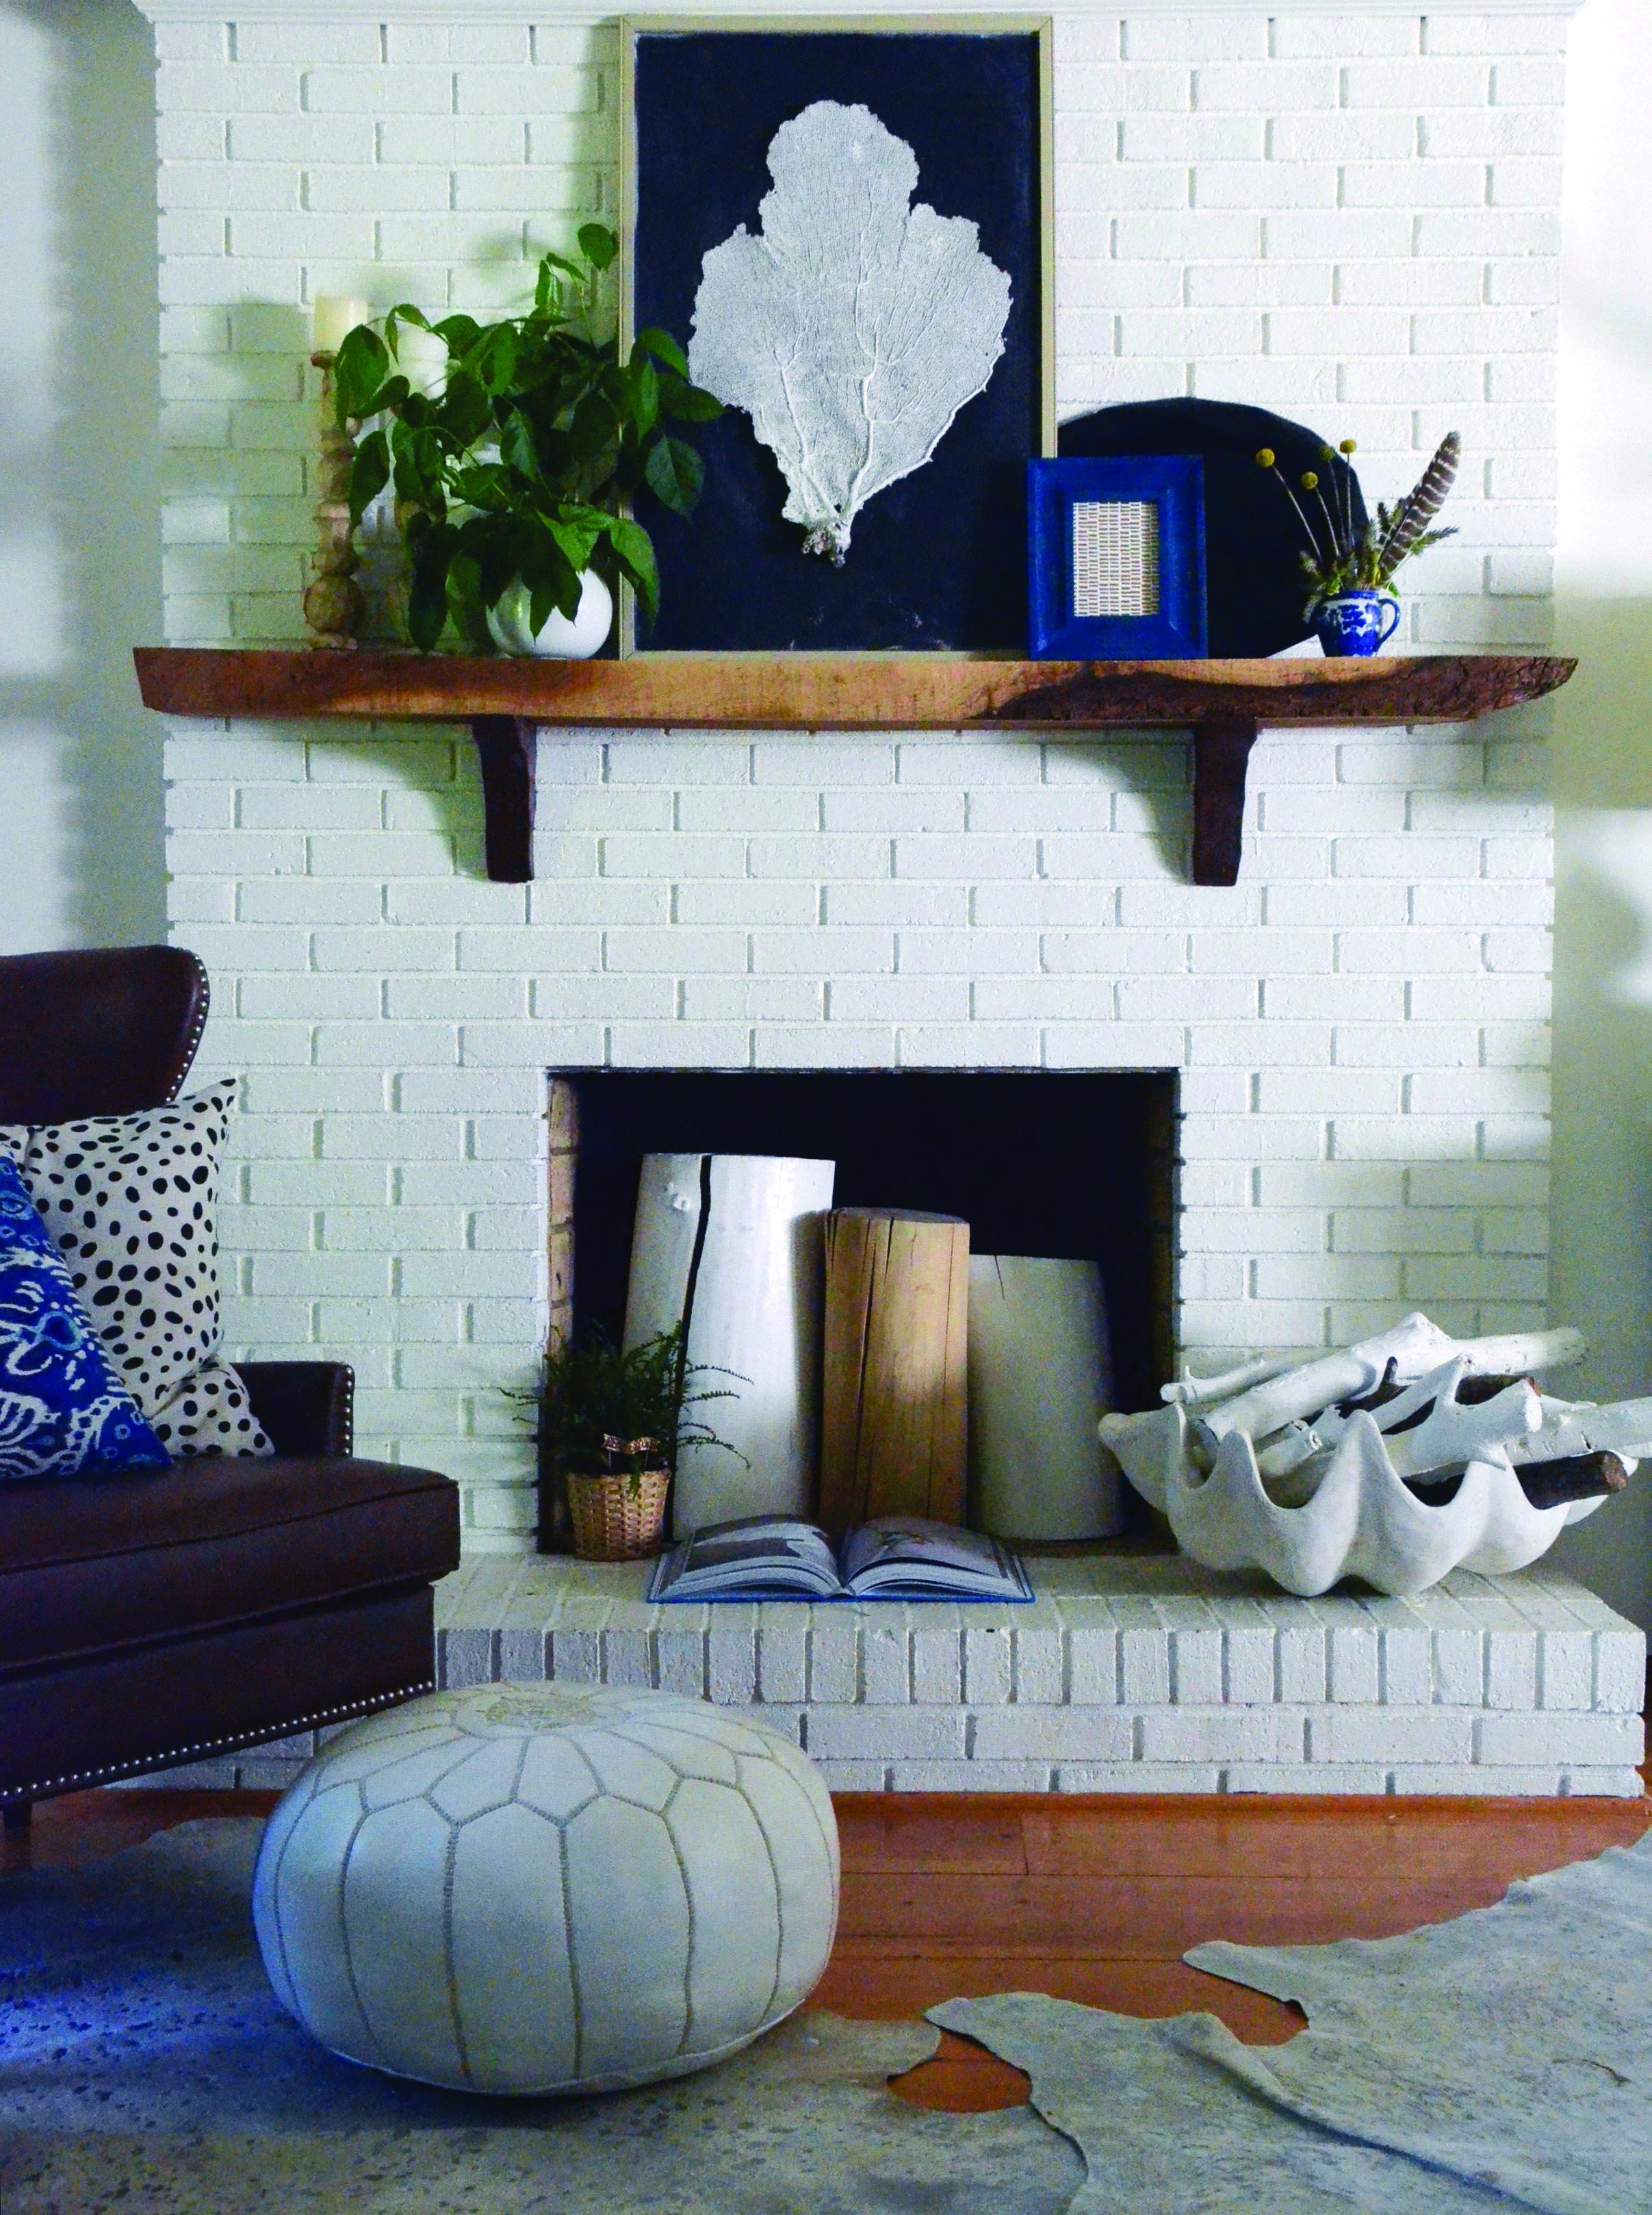 21 floor tile fireplace design ideas fireplace tile ideas tiles rh pinterest com